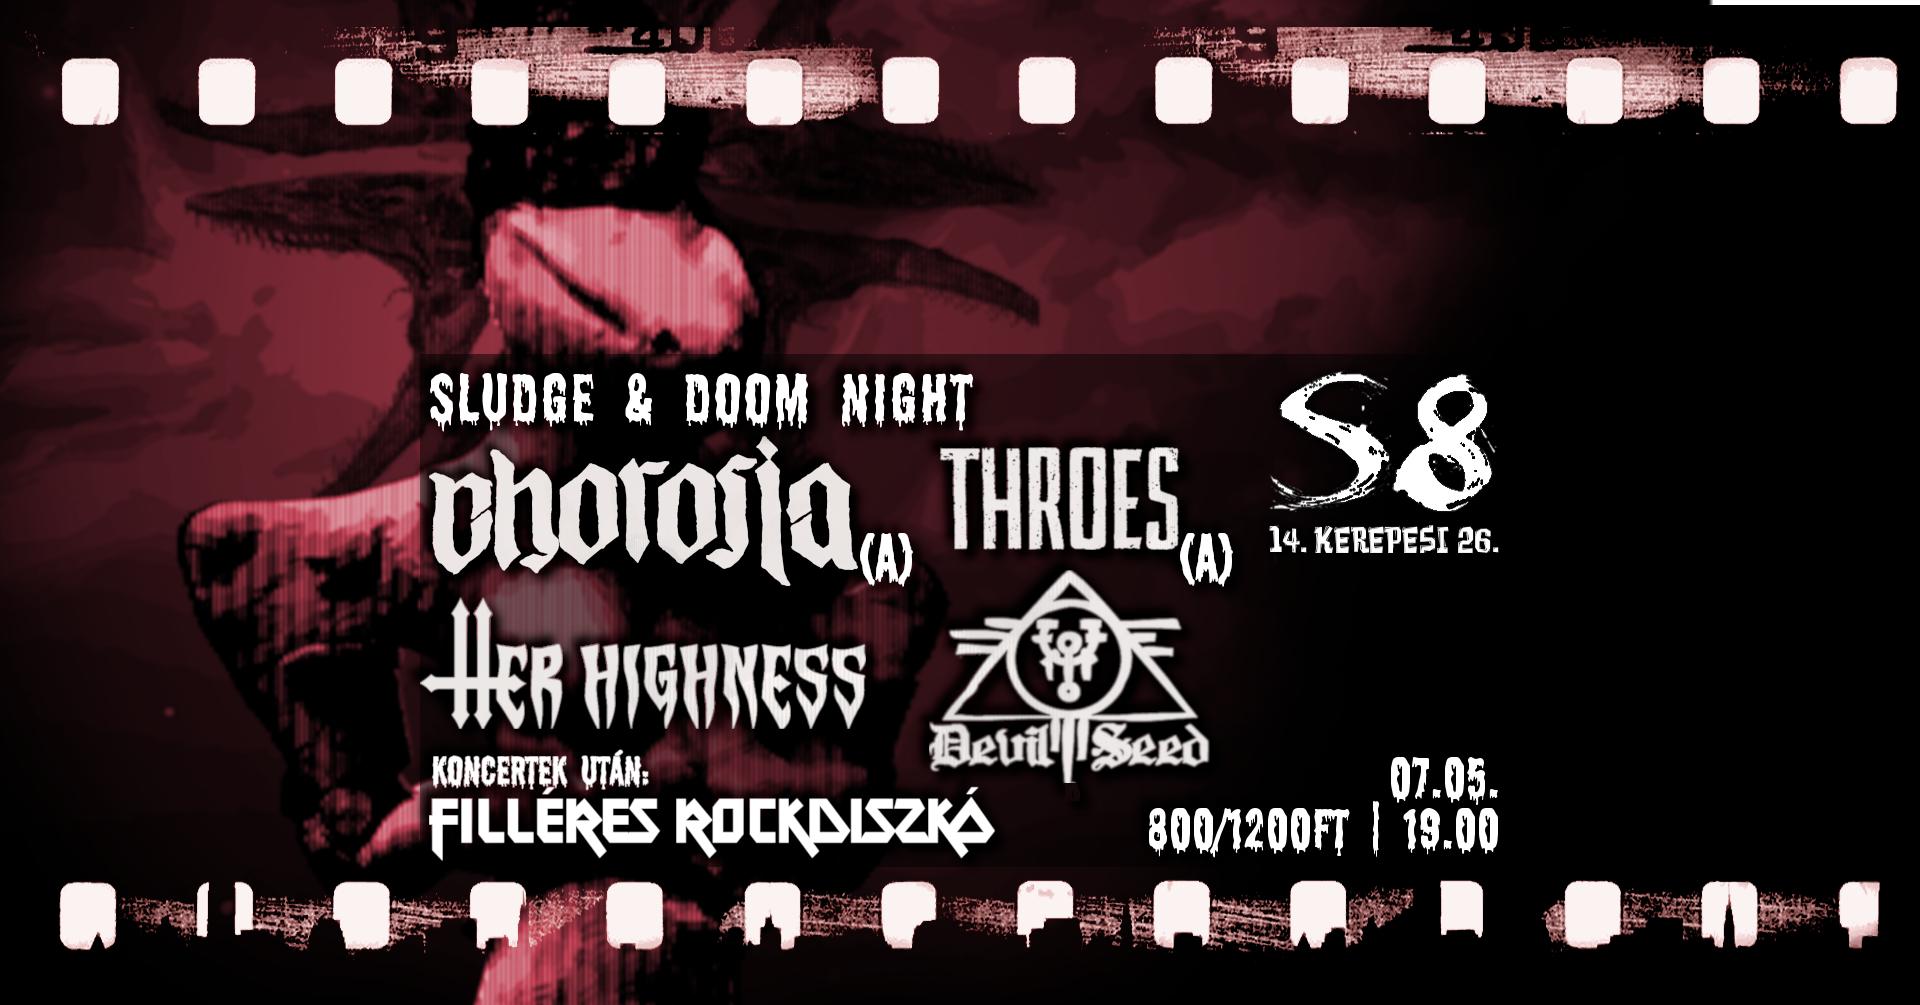 Sludge & Doom Night - Chorosia [A] I Throes [A] I Her Highness I Devil Seed